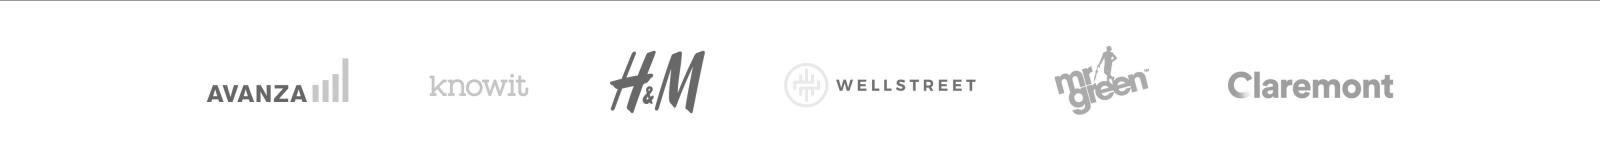 Customer logos Sprint